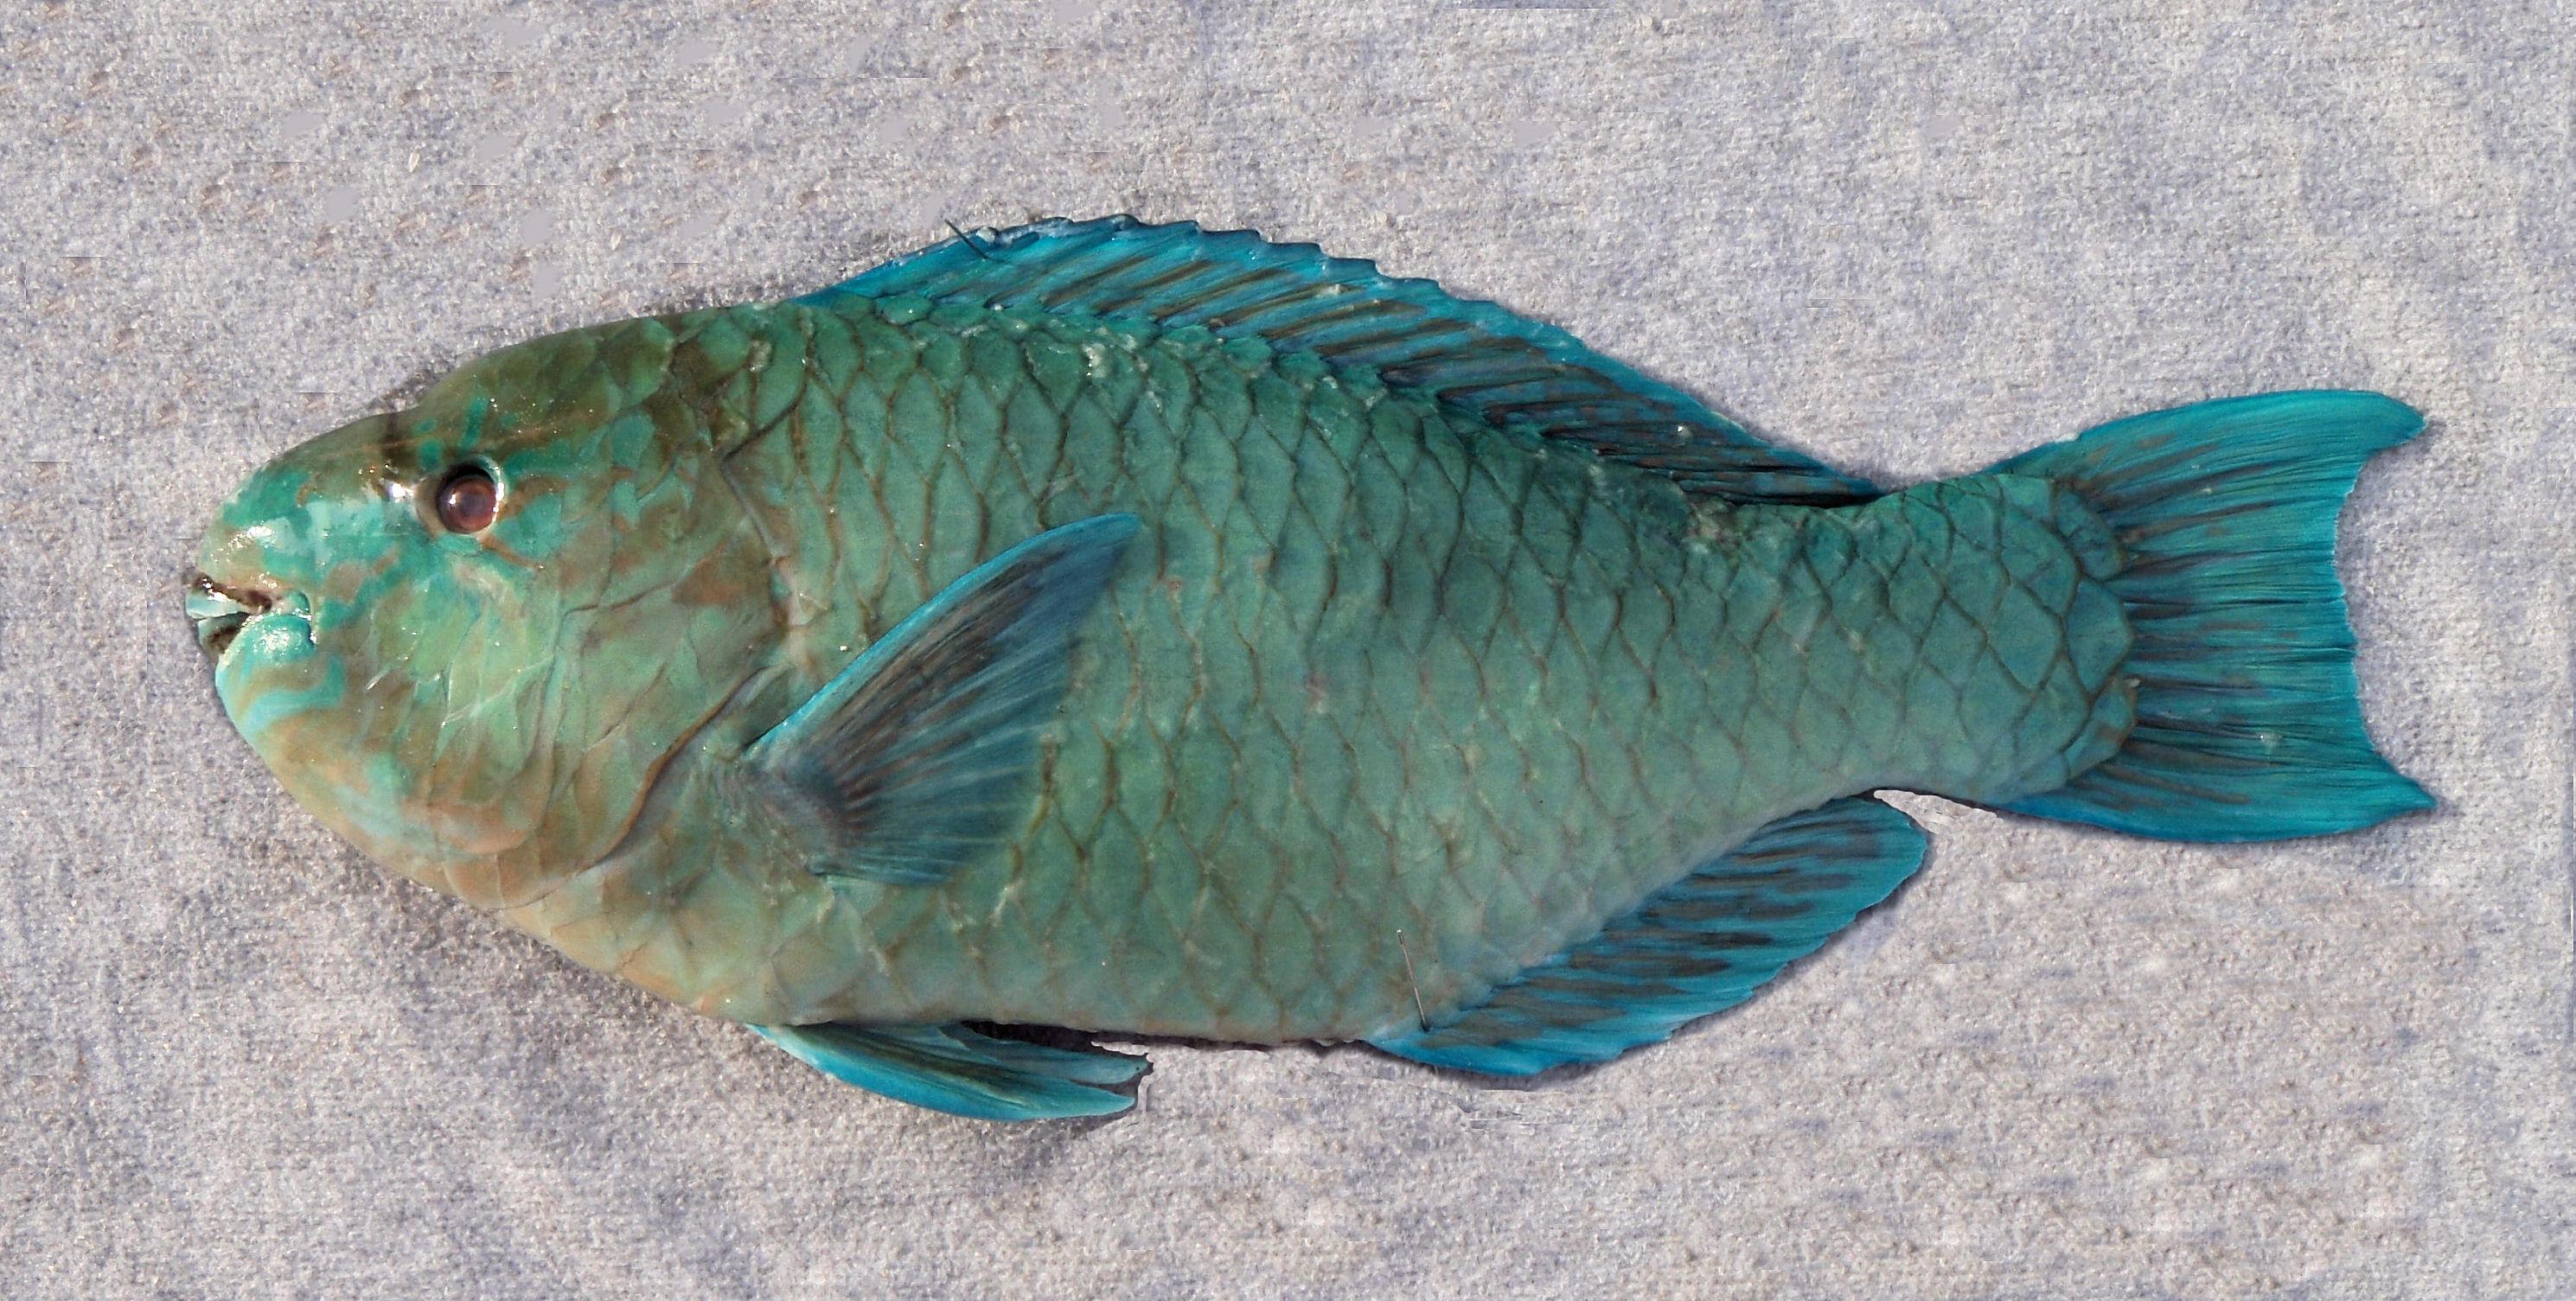 Azure parrotfish mexico fish marine life birds and for Tp fish market